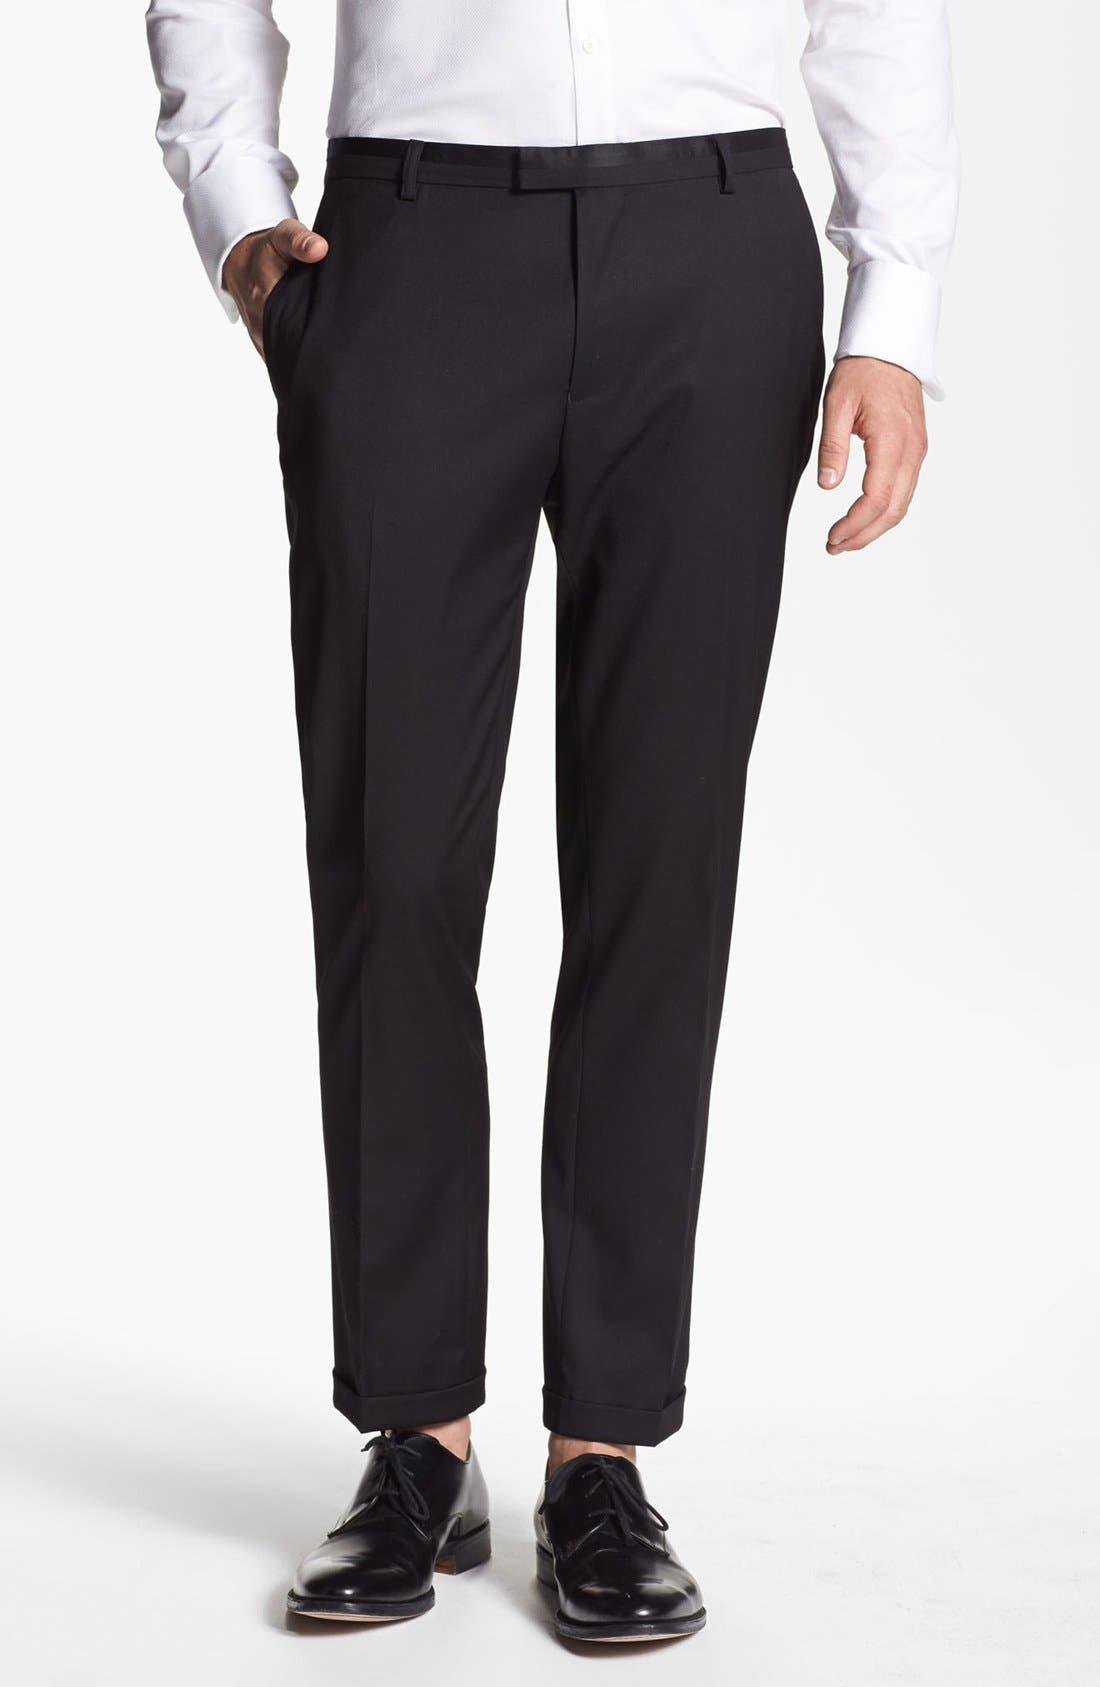 Main Image - Topman Skinny Fit Tuxedo Trousers